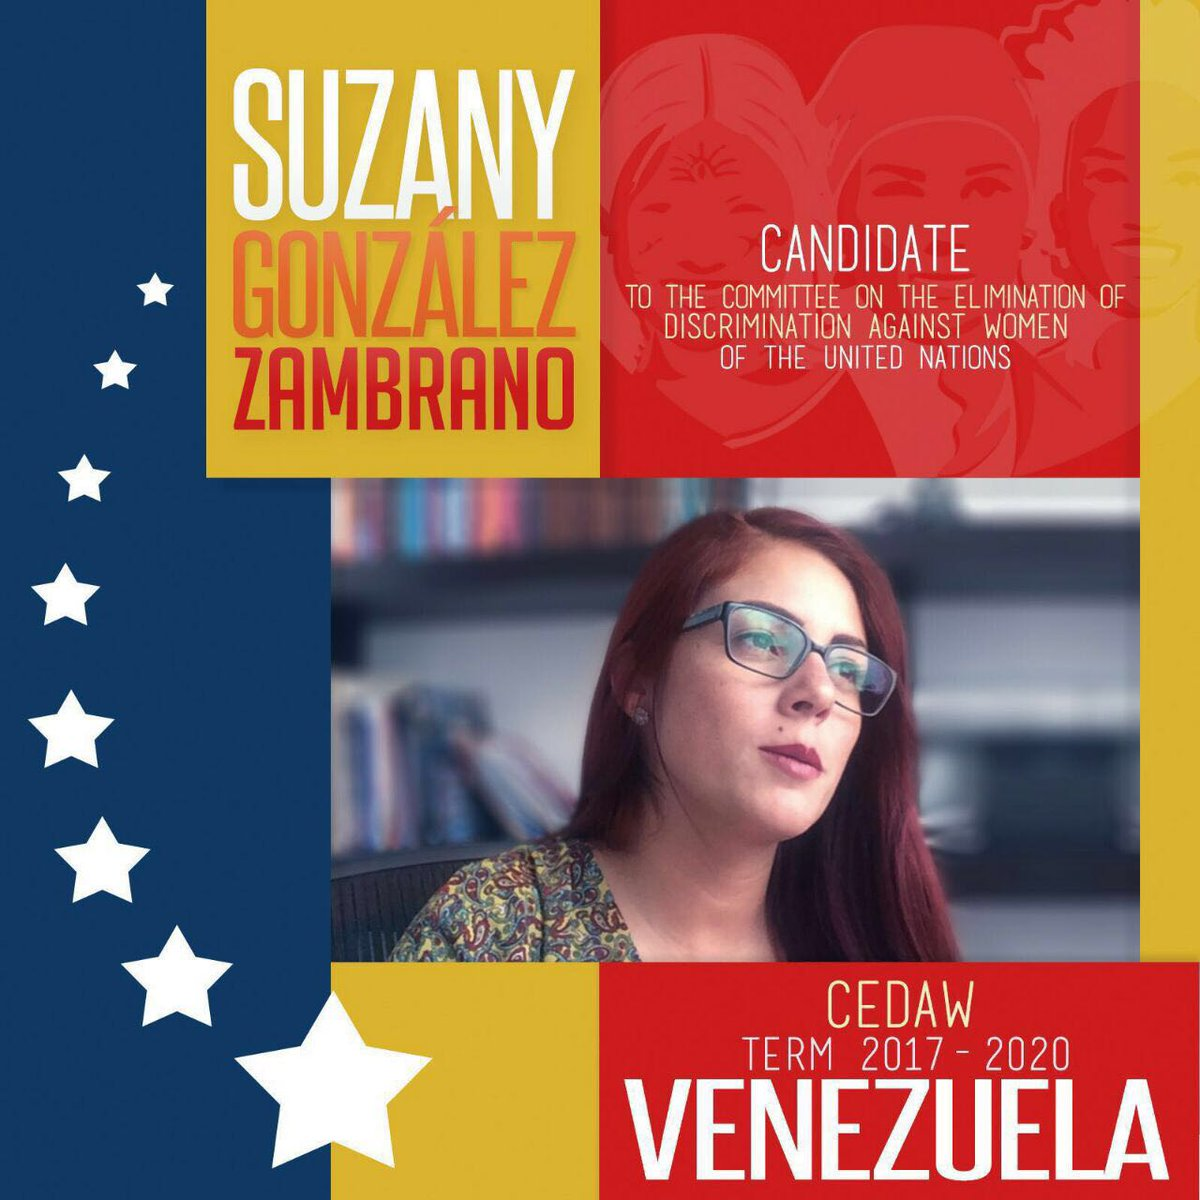 Apoyamos a @SuzanyGonzalez Candidata X Venezuela al Comité de Expertas #CEDAW Activista Feminista comprometida https://t.co/qfXAbfiH5m